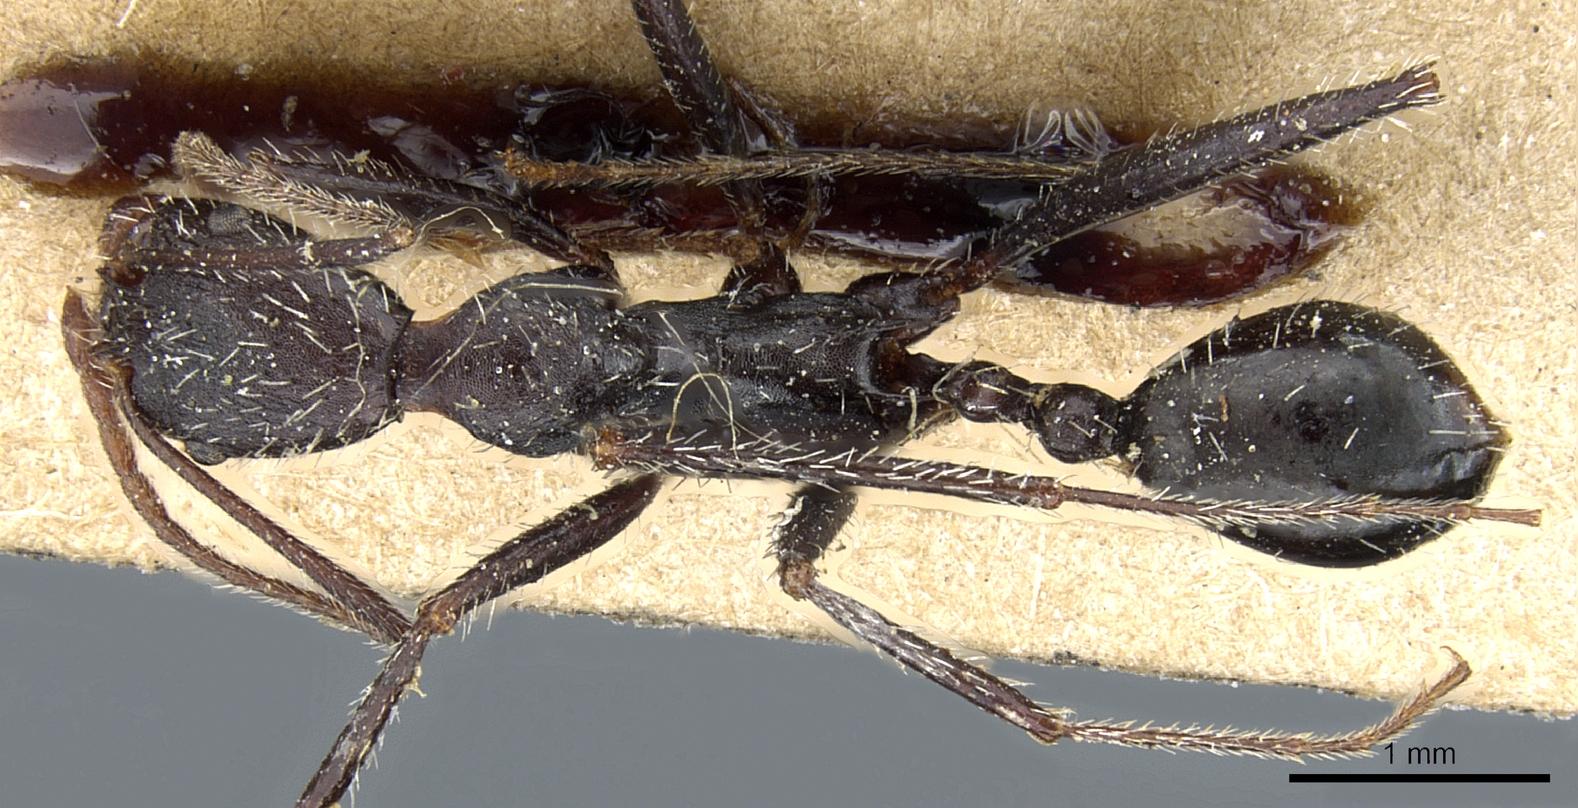 Aphaenogaster iberica image